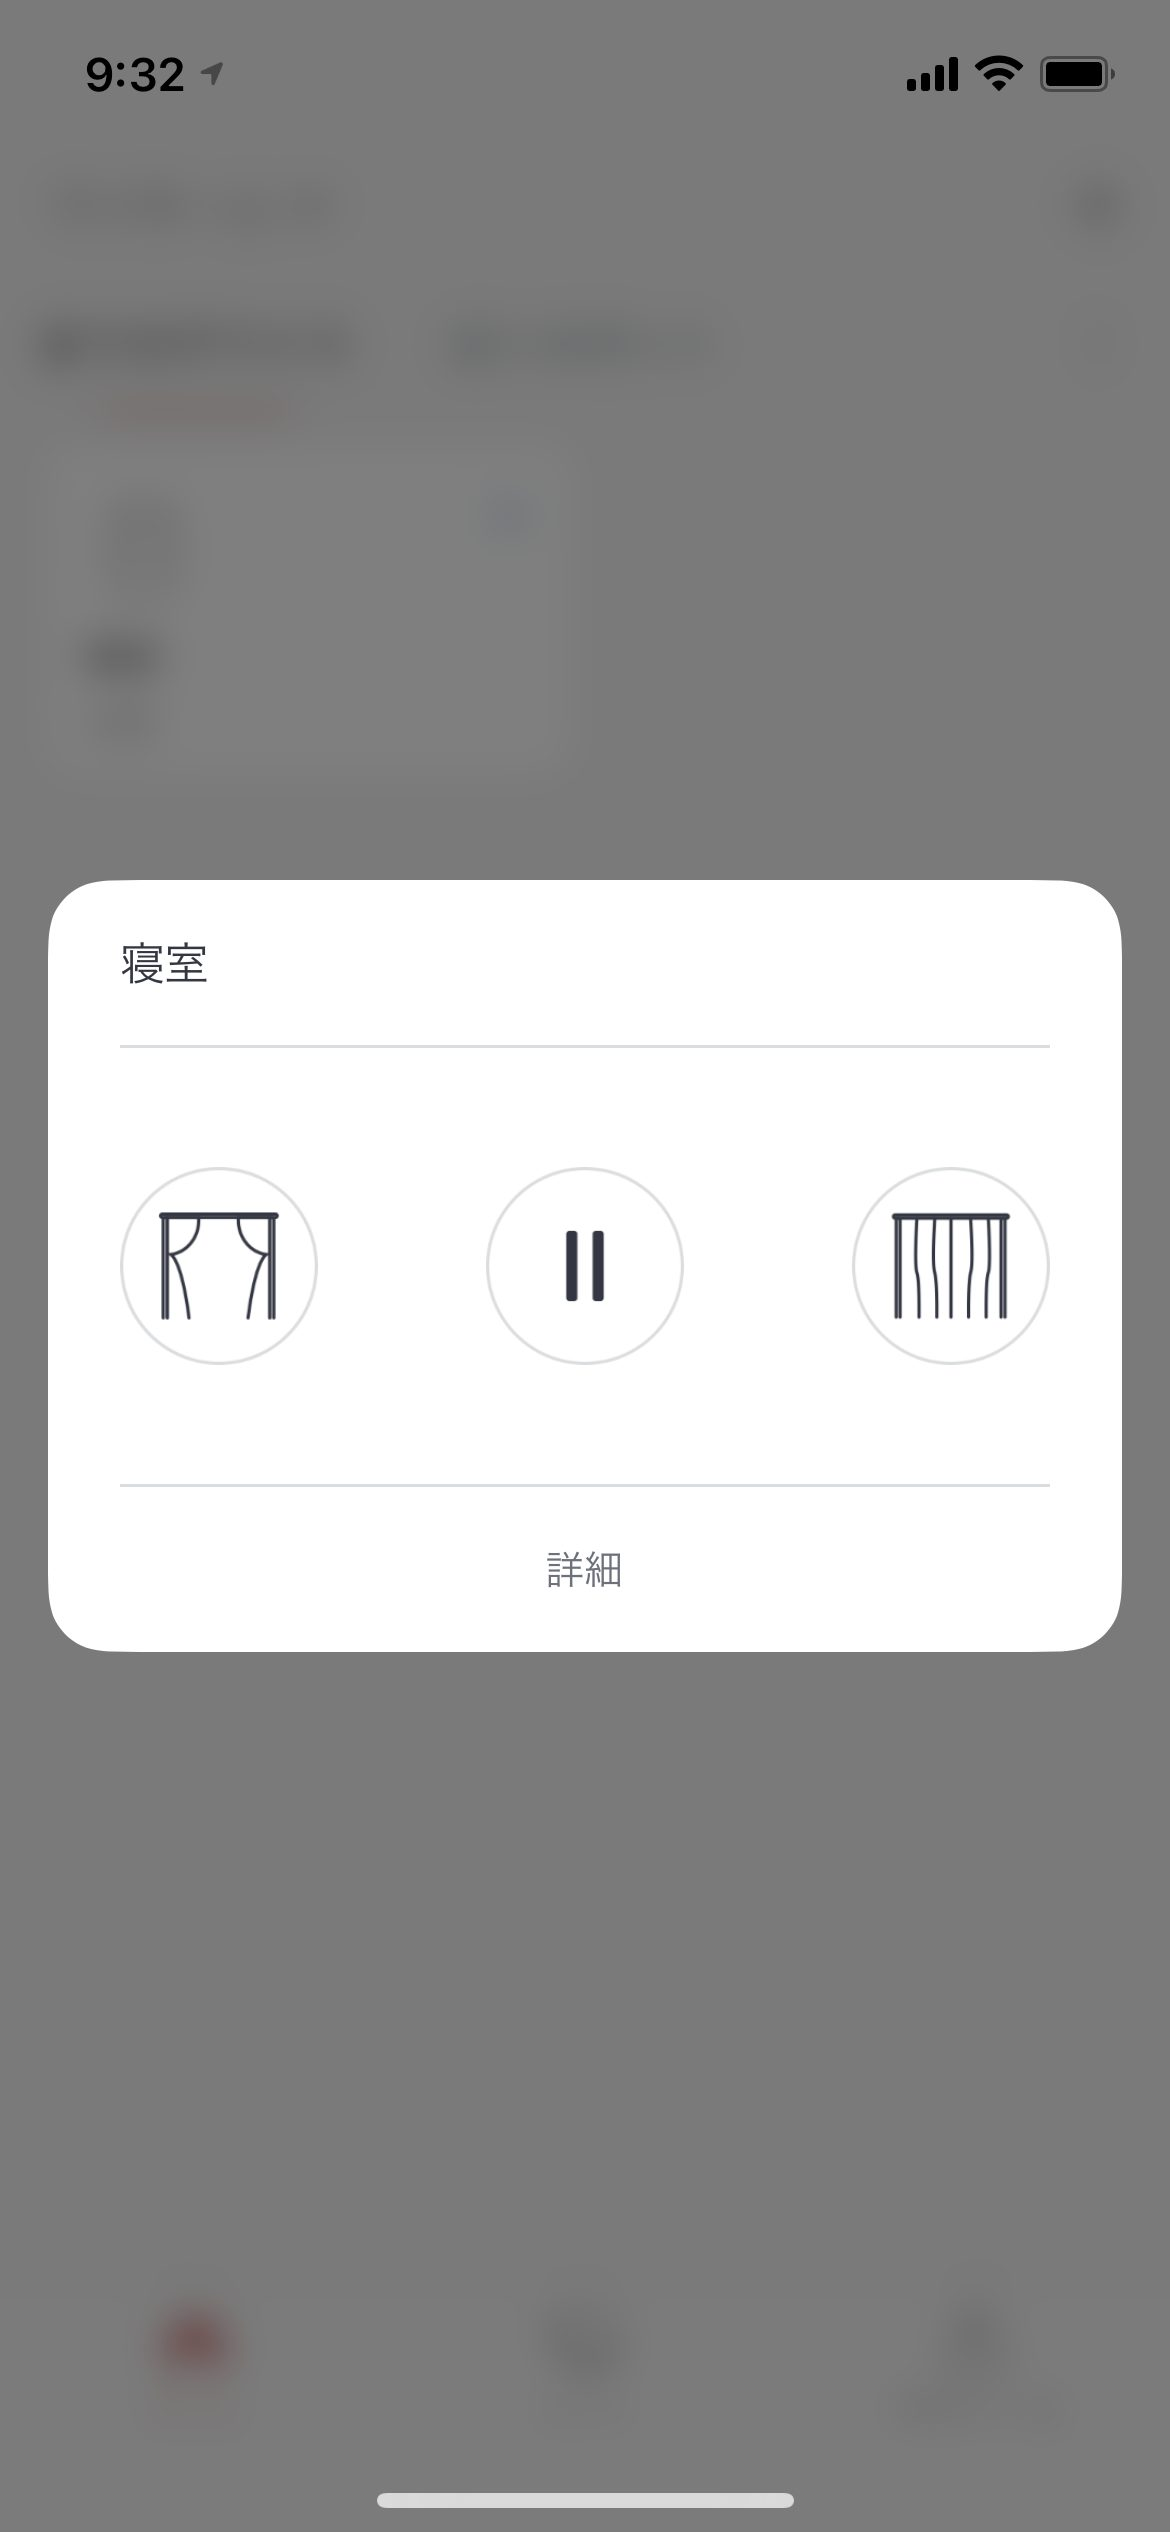 SwitchBotカーテンのレビュー・口コミー・口コミ